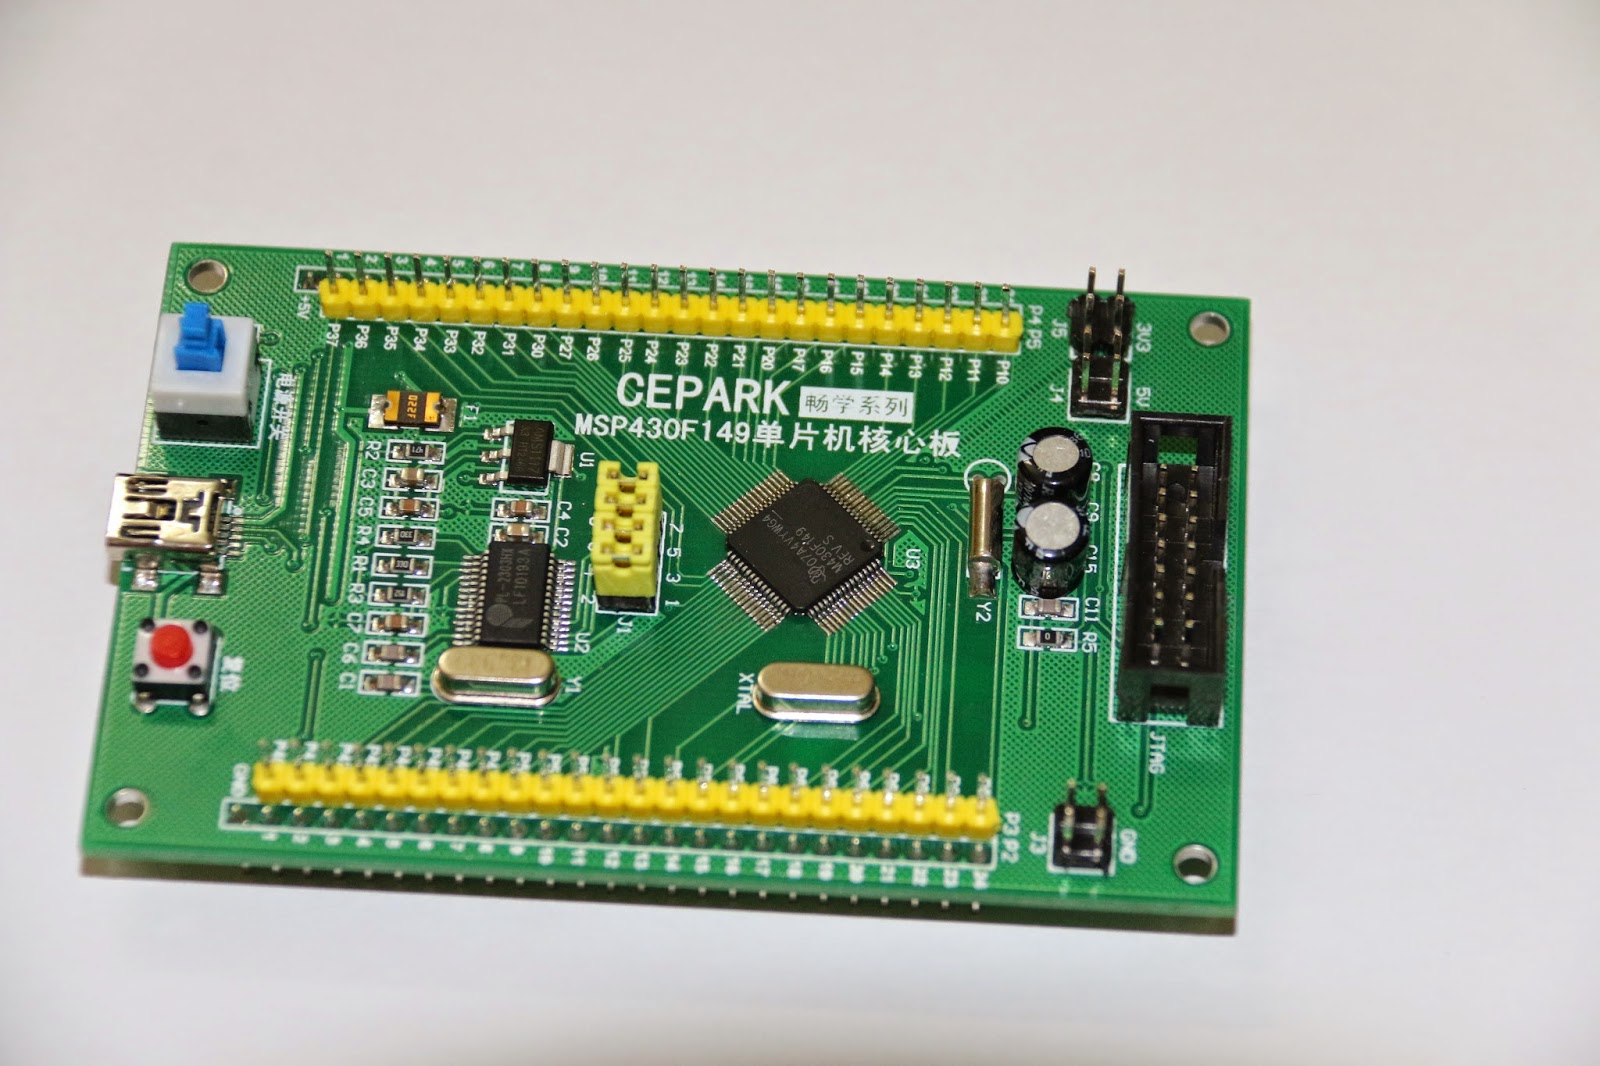 CEPARK MSP430